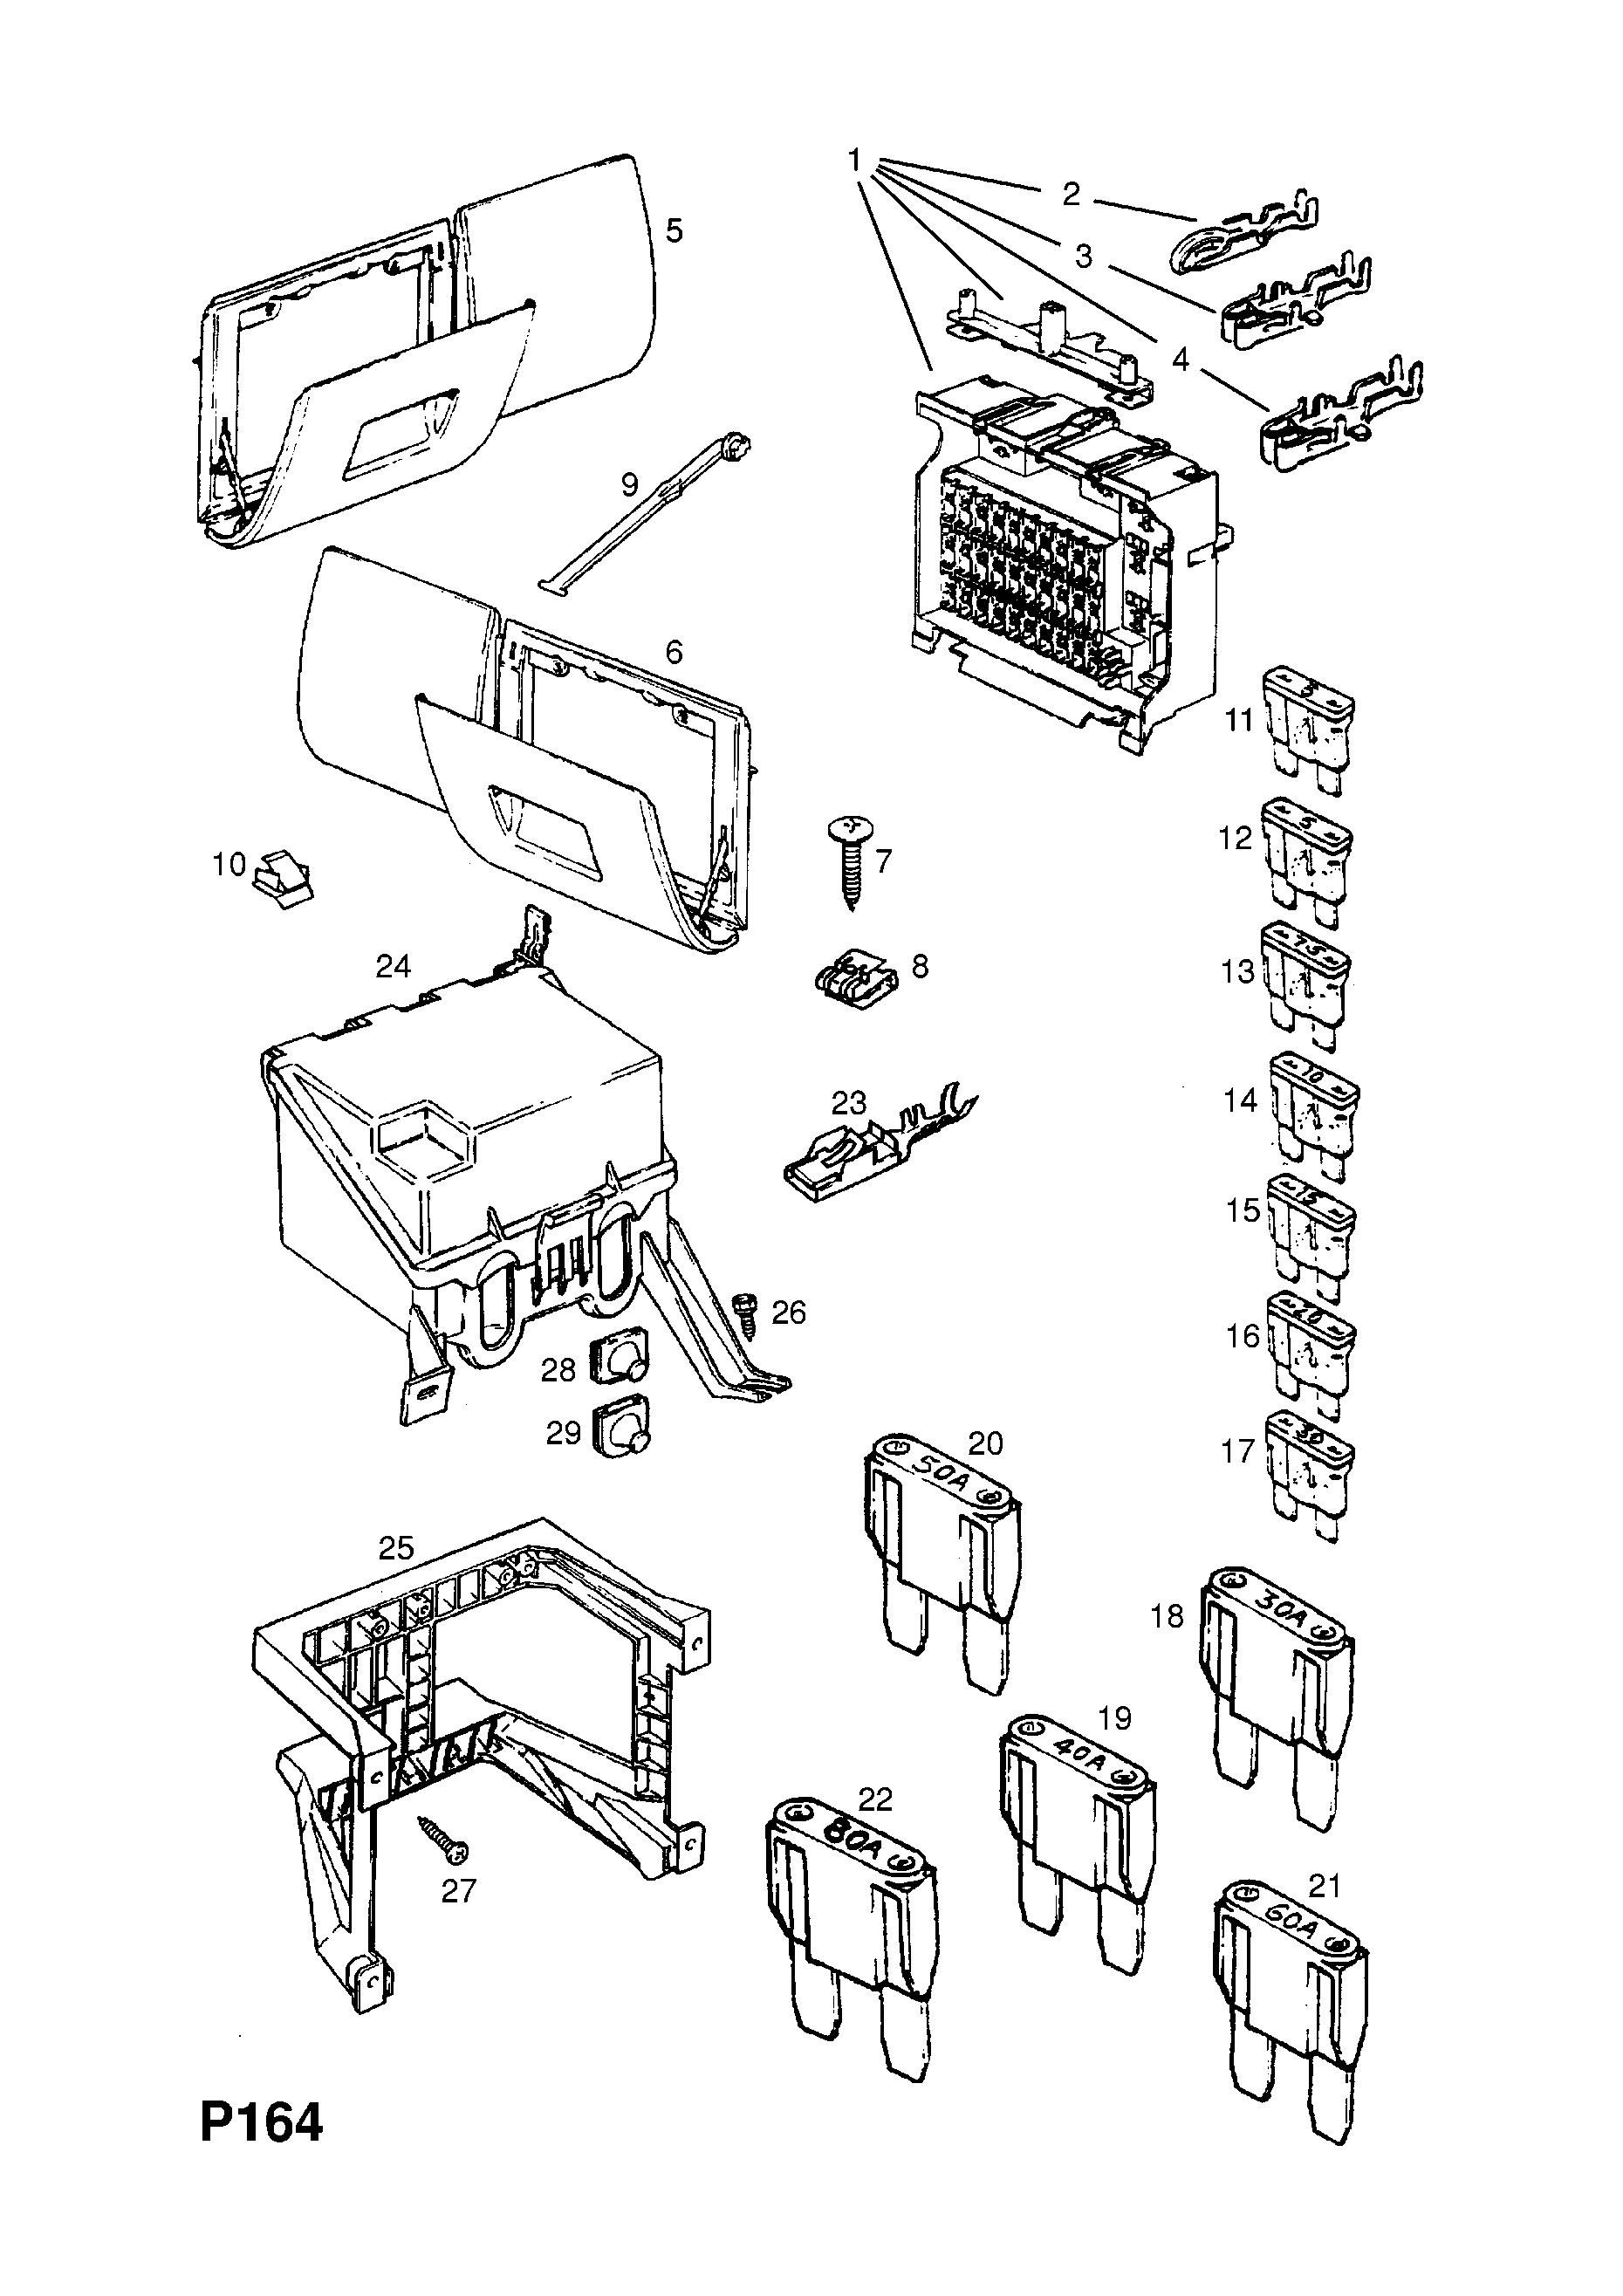 Fuse Box Diagram For Corsa B